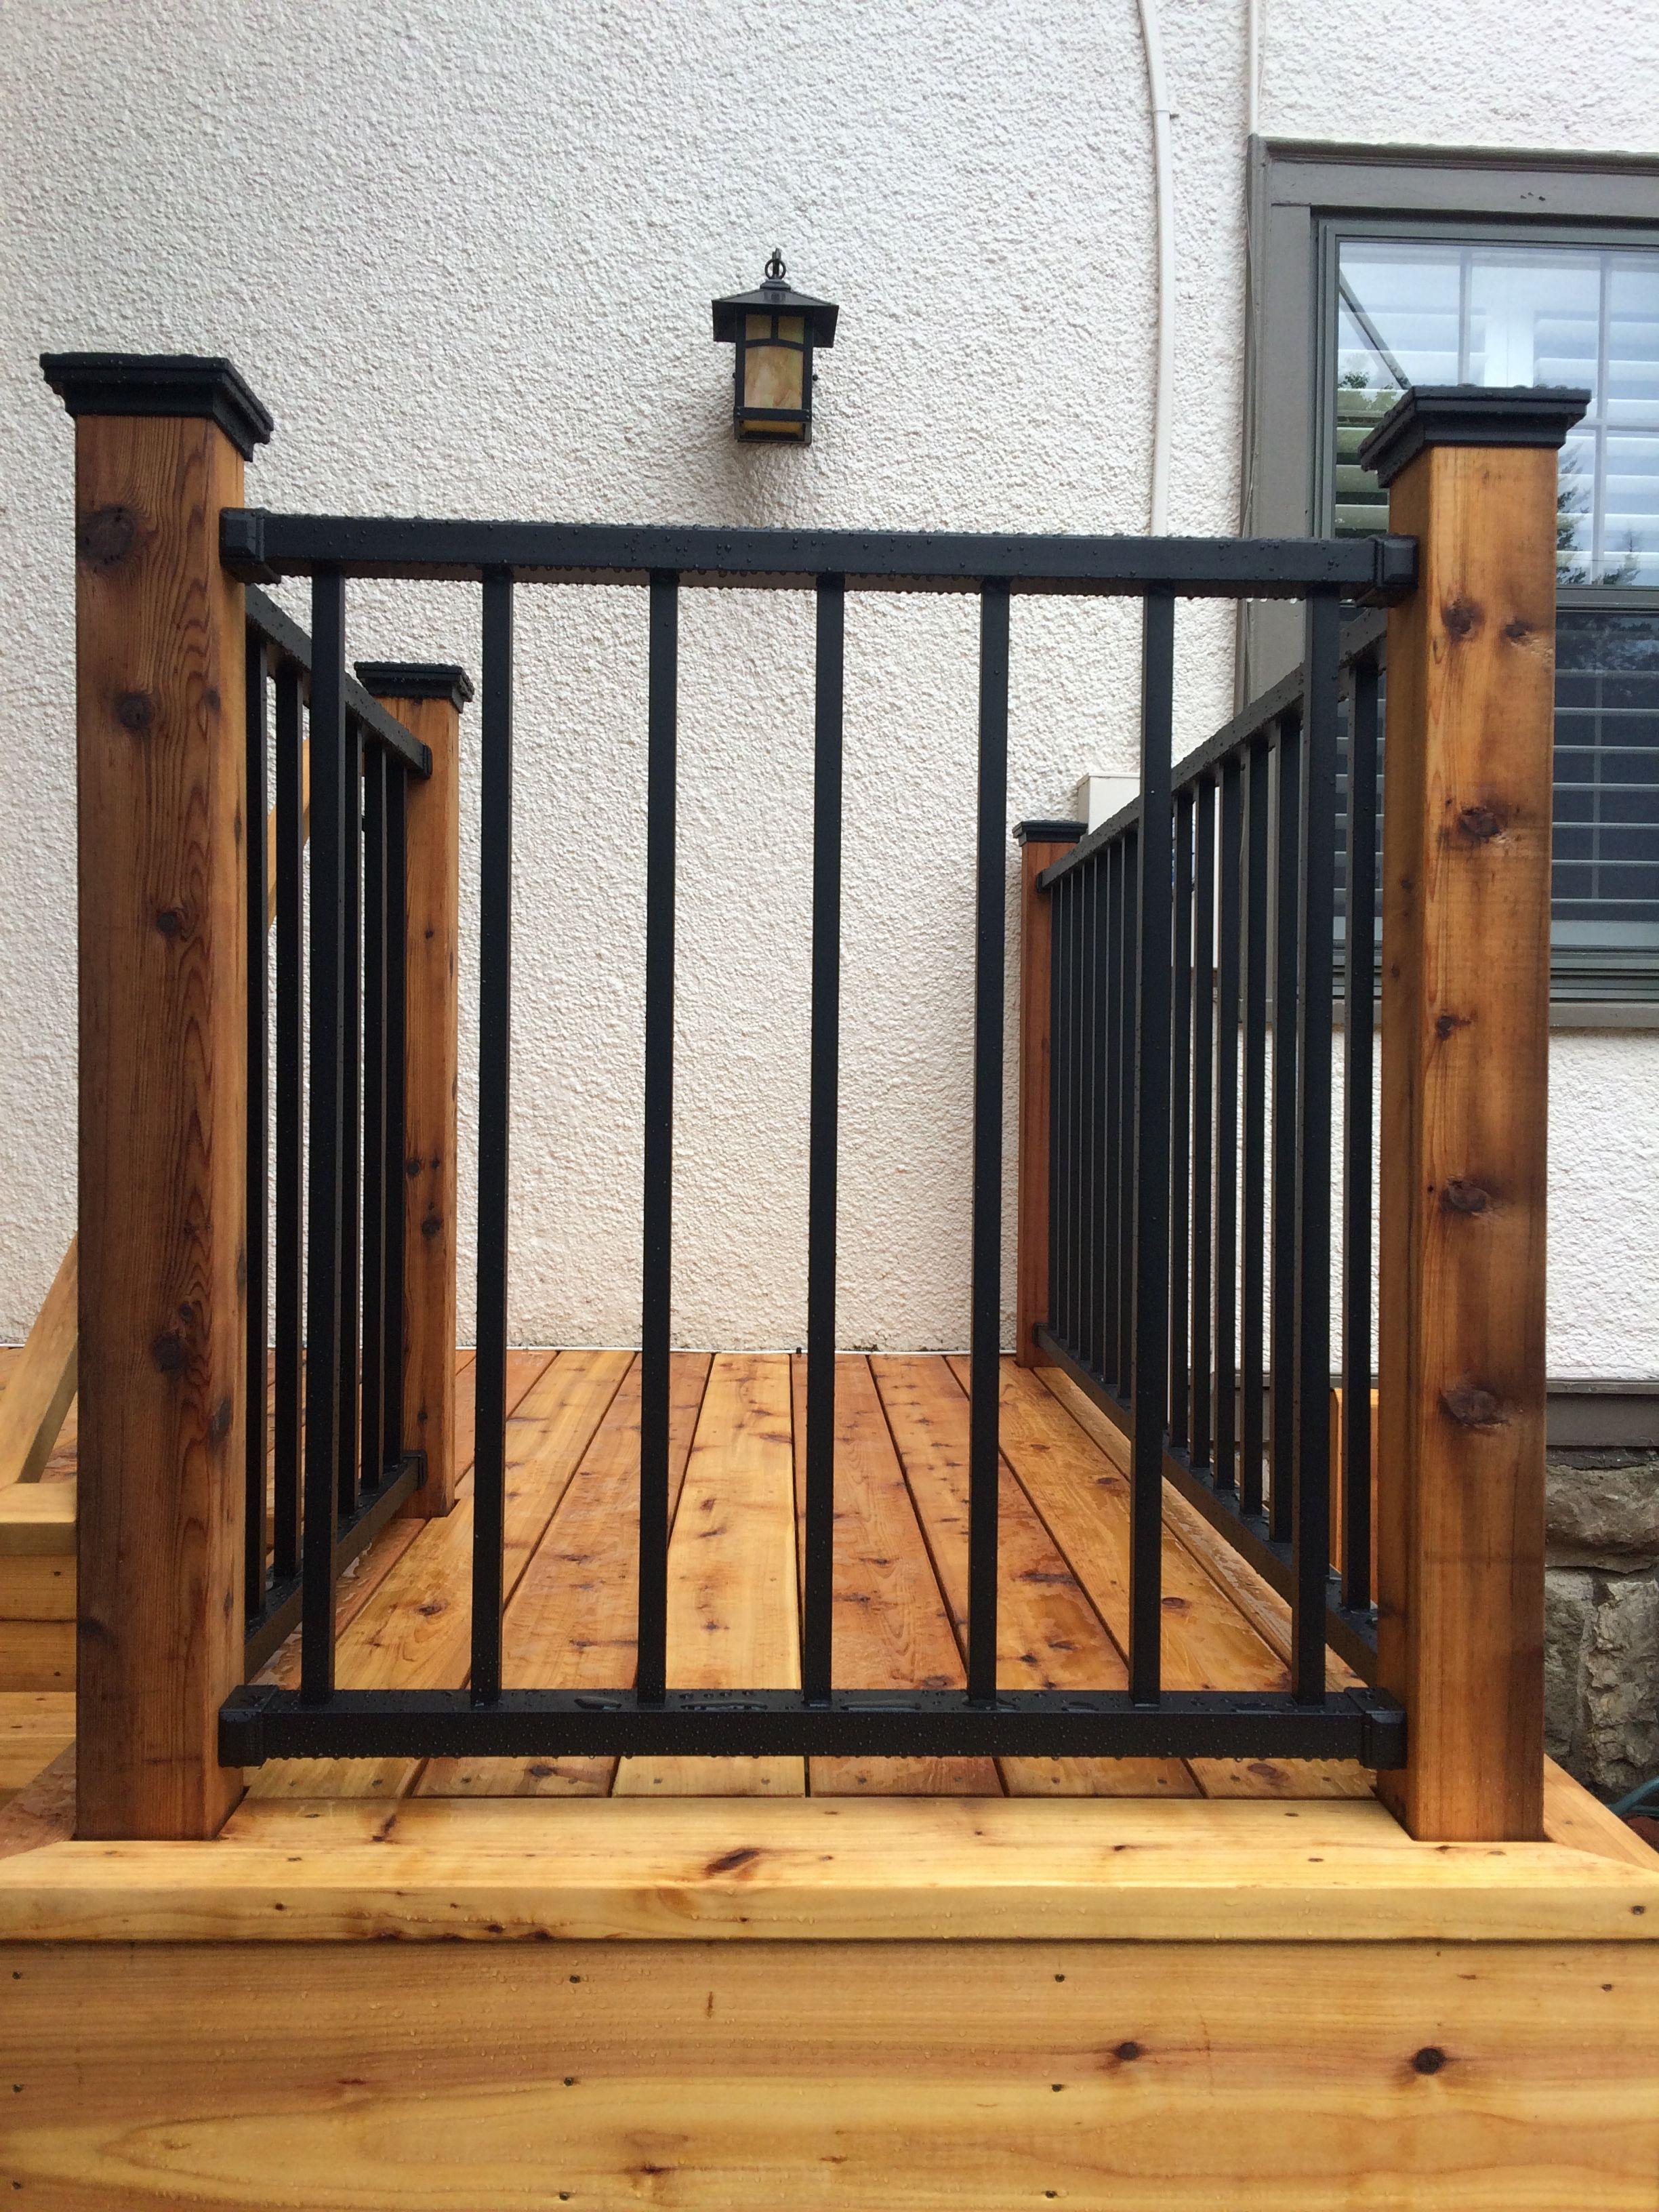 Westbury Aluminum Railing Black Attached To Cedar Posts | Black Outdoor Stair Railing | Interior Stair | Modern | Pipe | Composite Deck | 2 Step